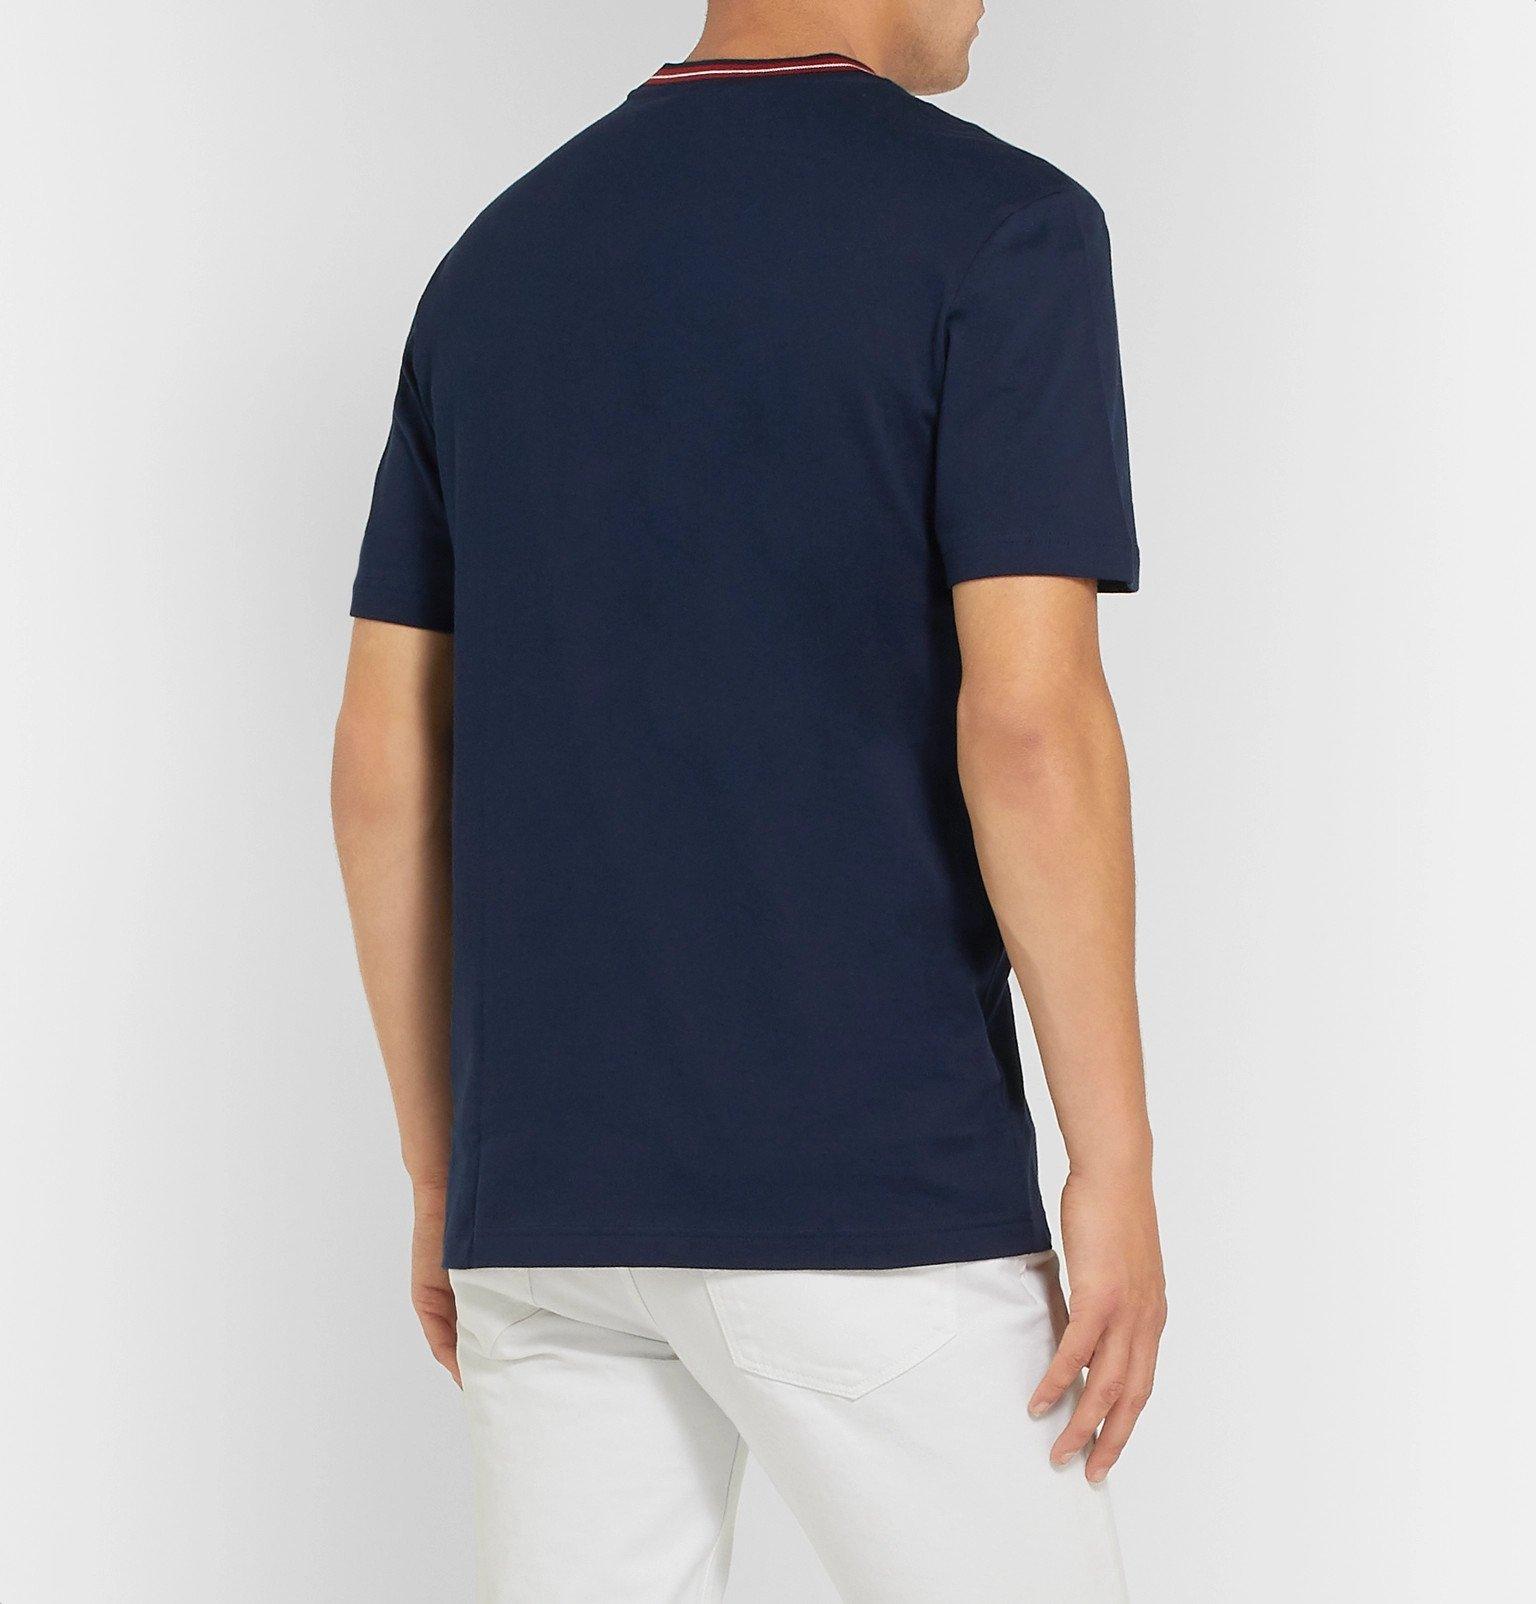 Lacoste - Stripe-Trimmed Pima Cotton-Jersey T-Shirt - Blue